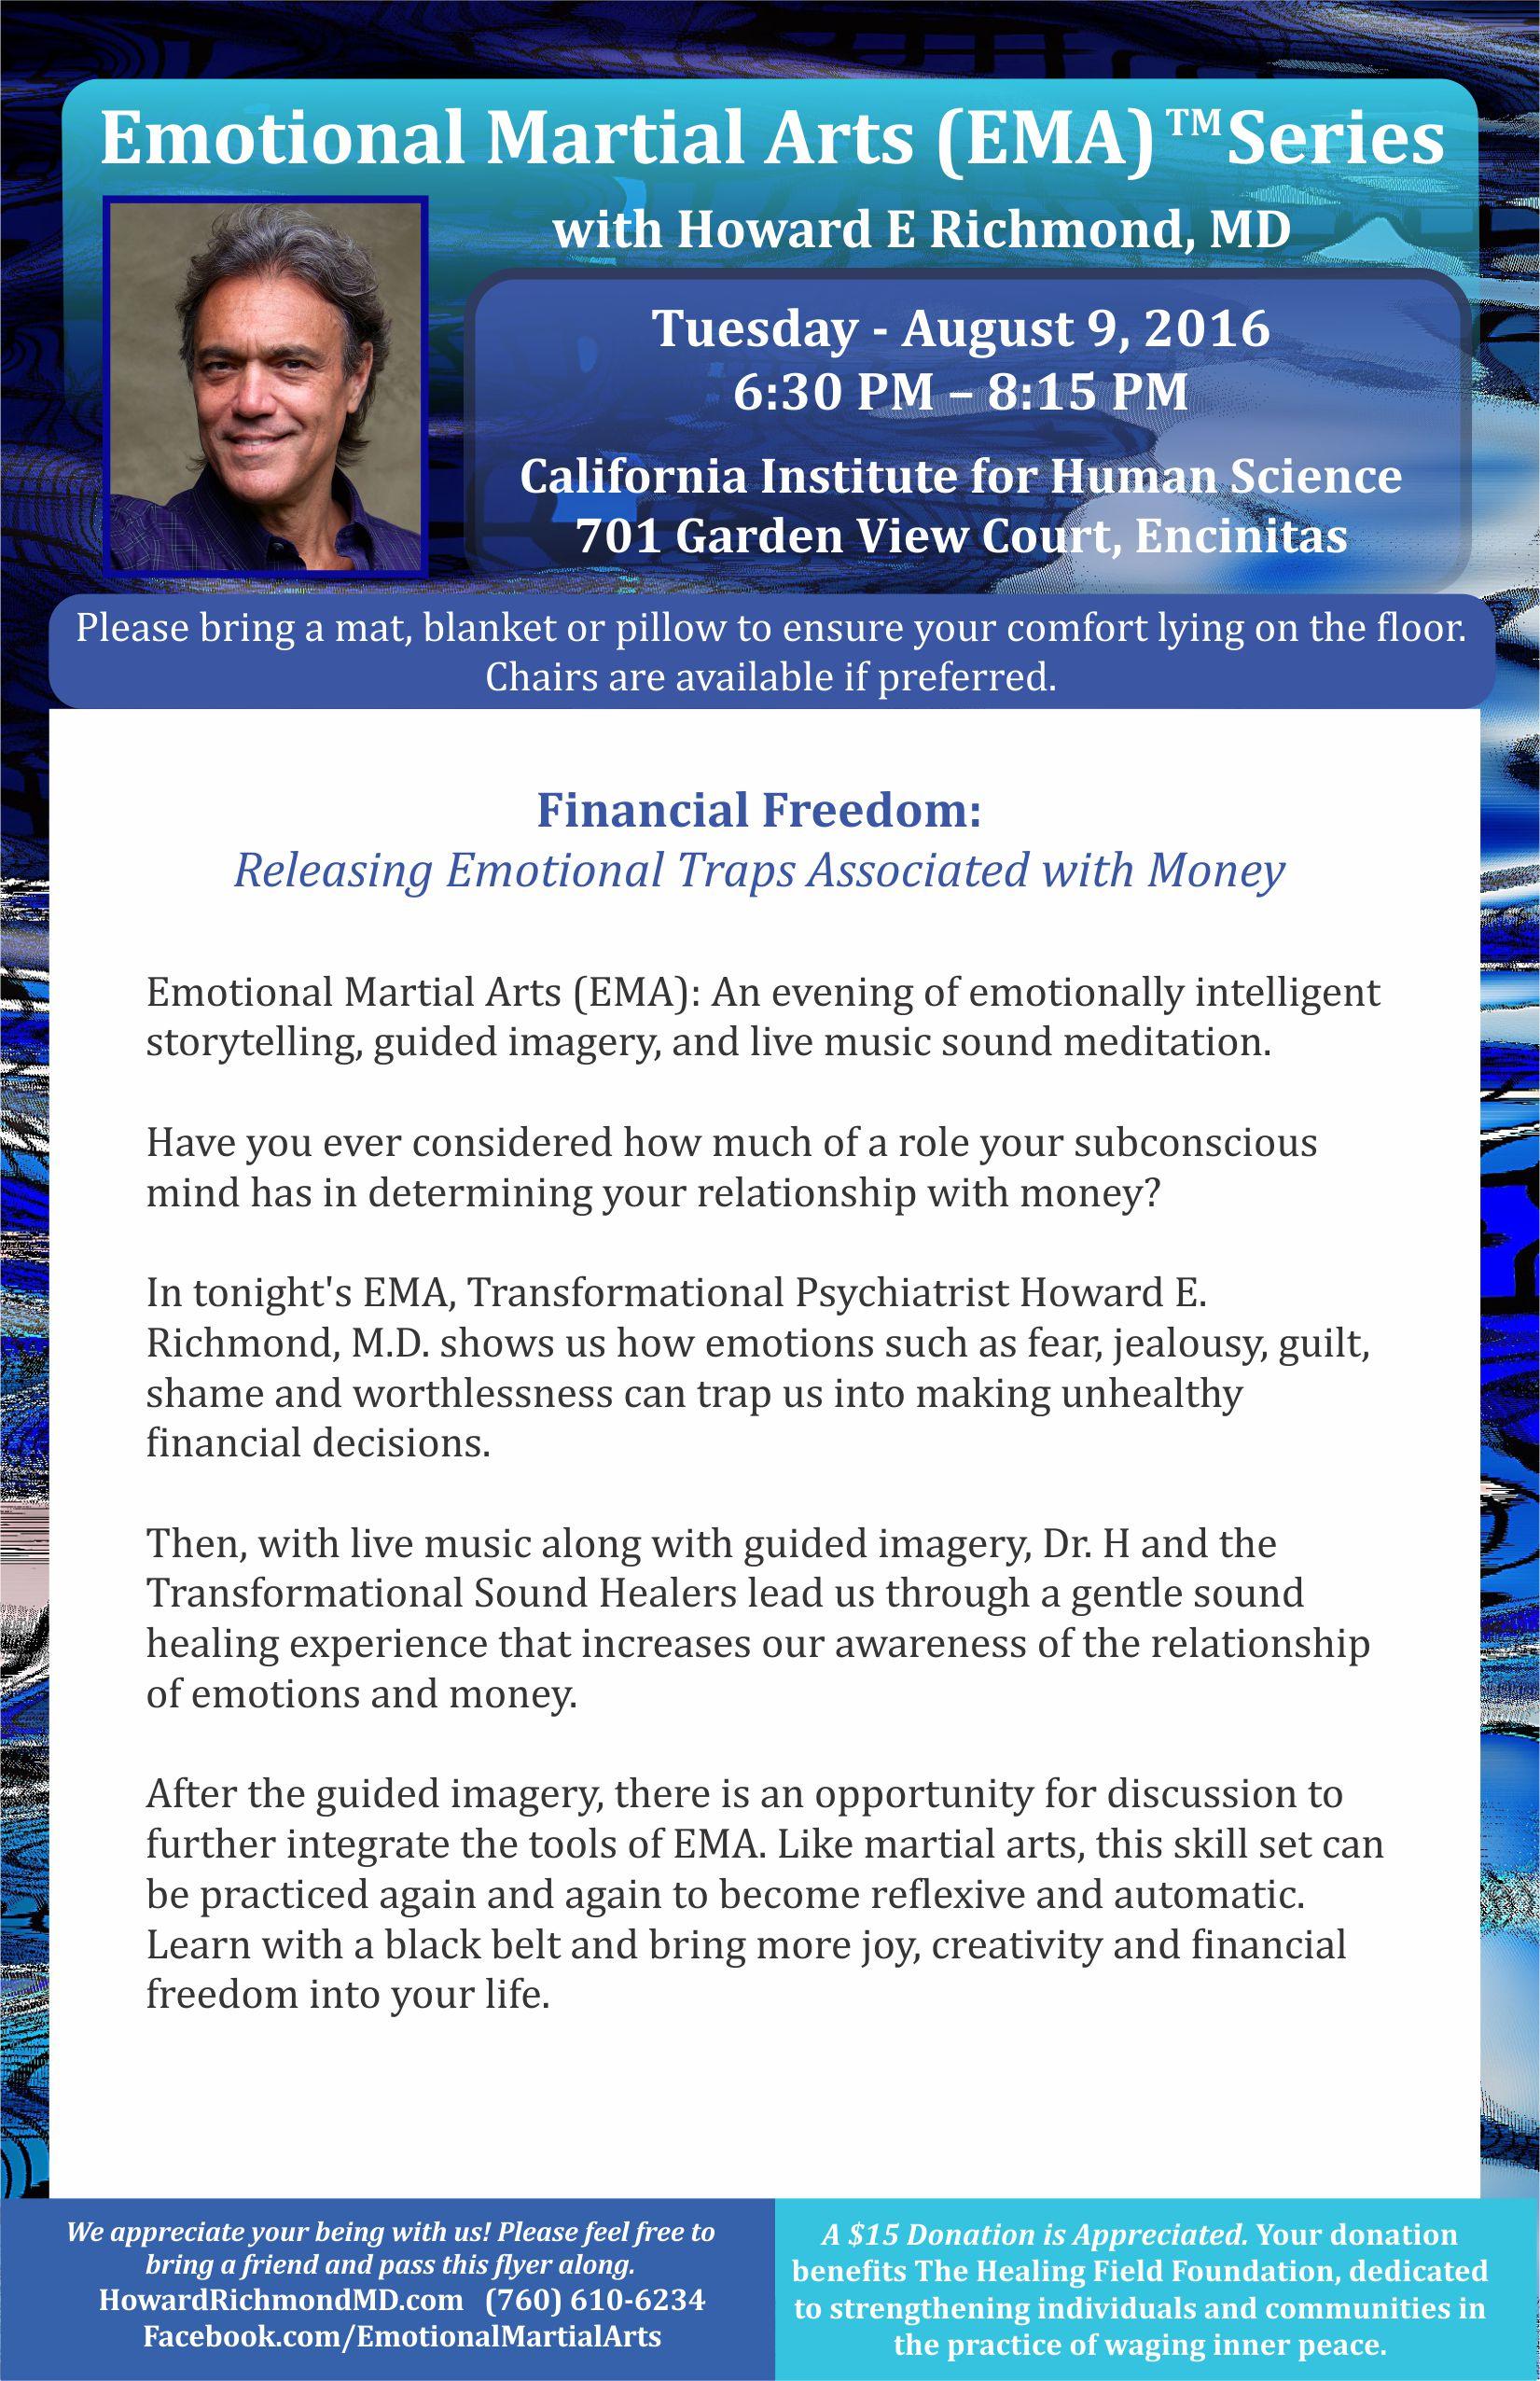 Financial Freedom - half sheet